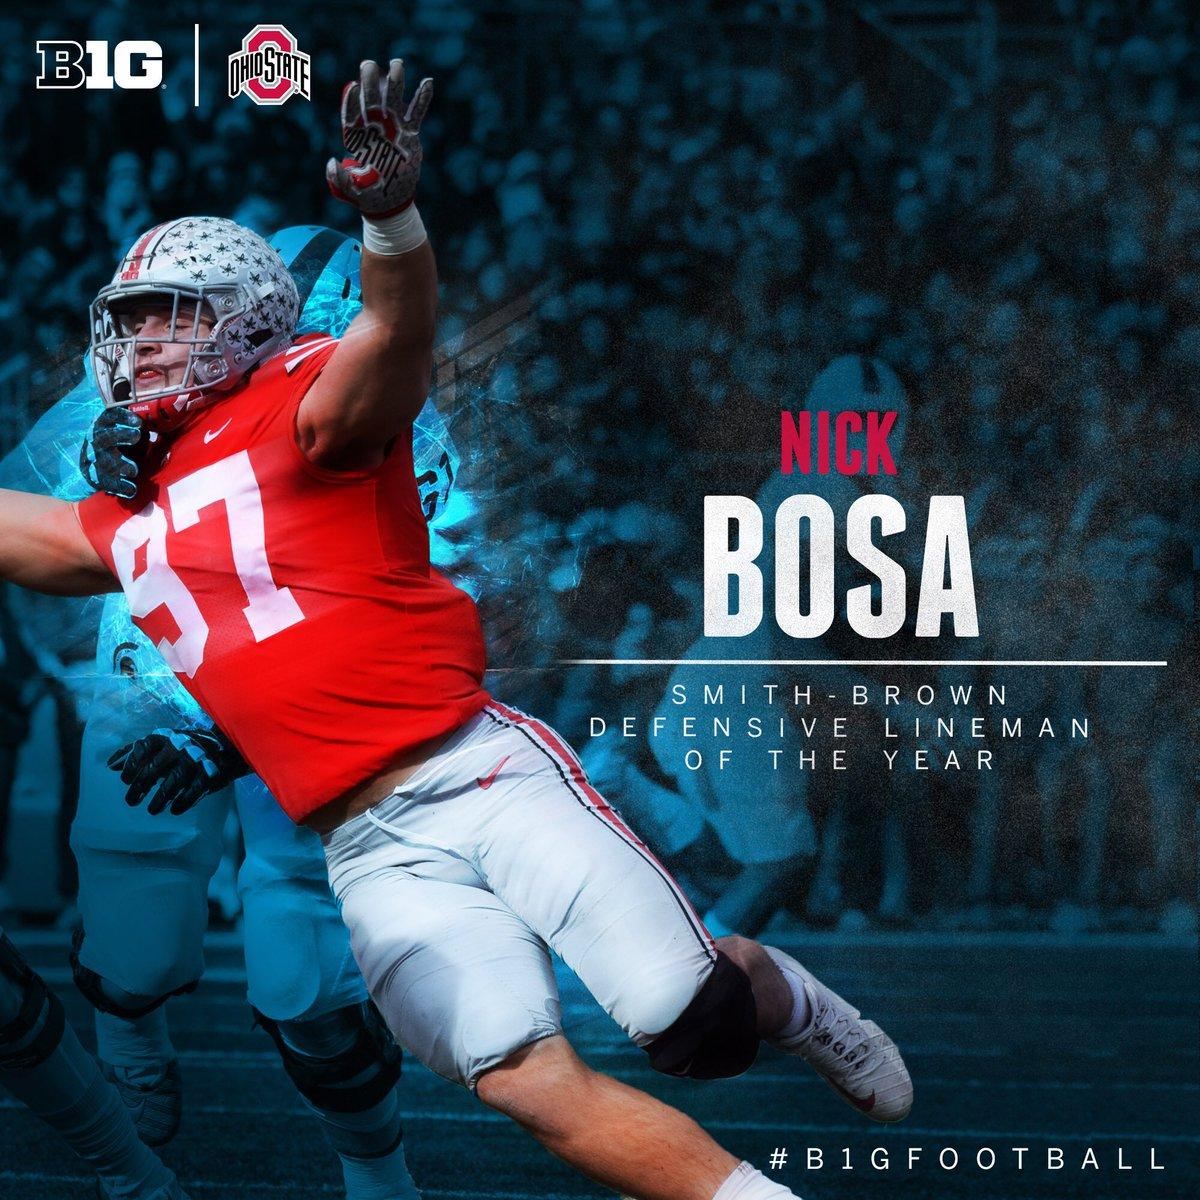 Nick Bosa of @OhioStateFB named 2017 #B1GFootball named 2017 #B1GFootball Smith-Brown Defensive Lineman of the Year. https://t.co/XcjCf67AfL